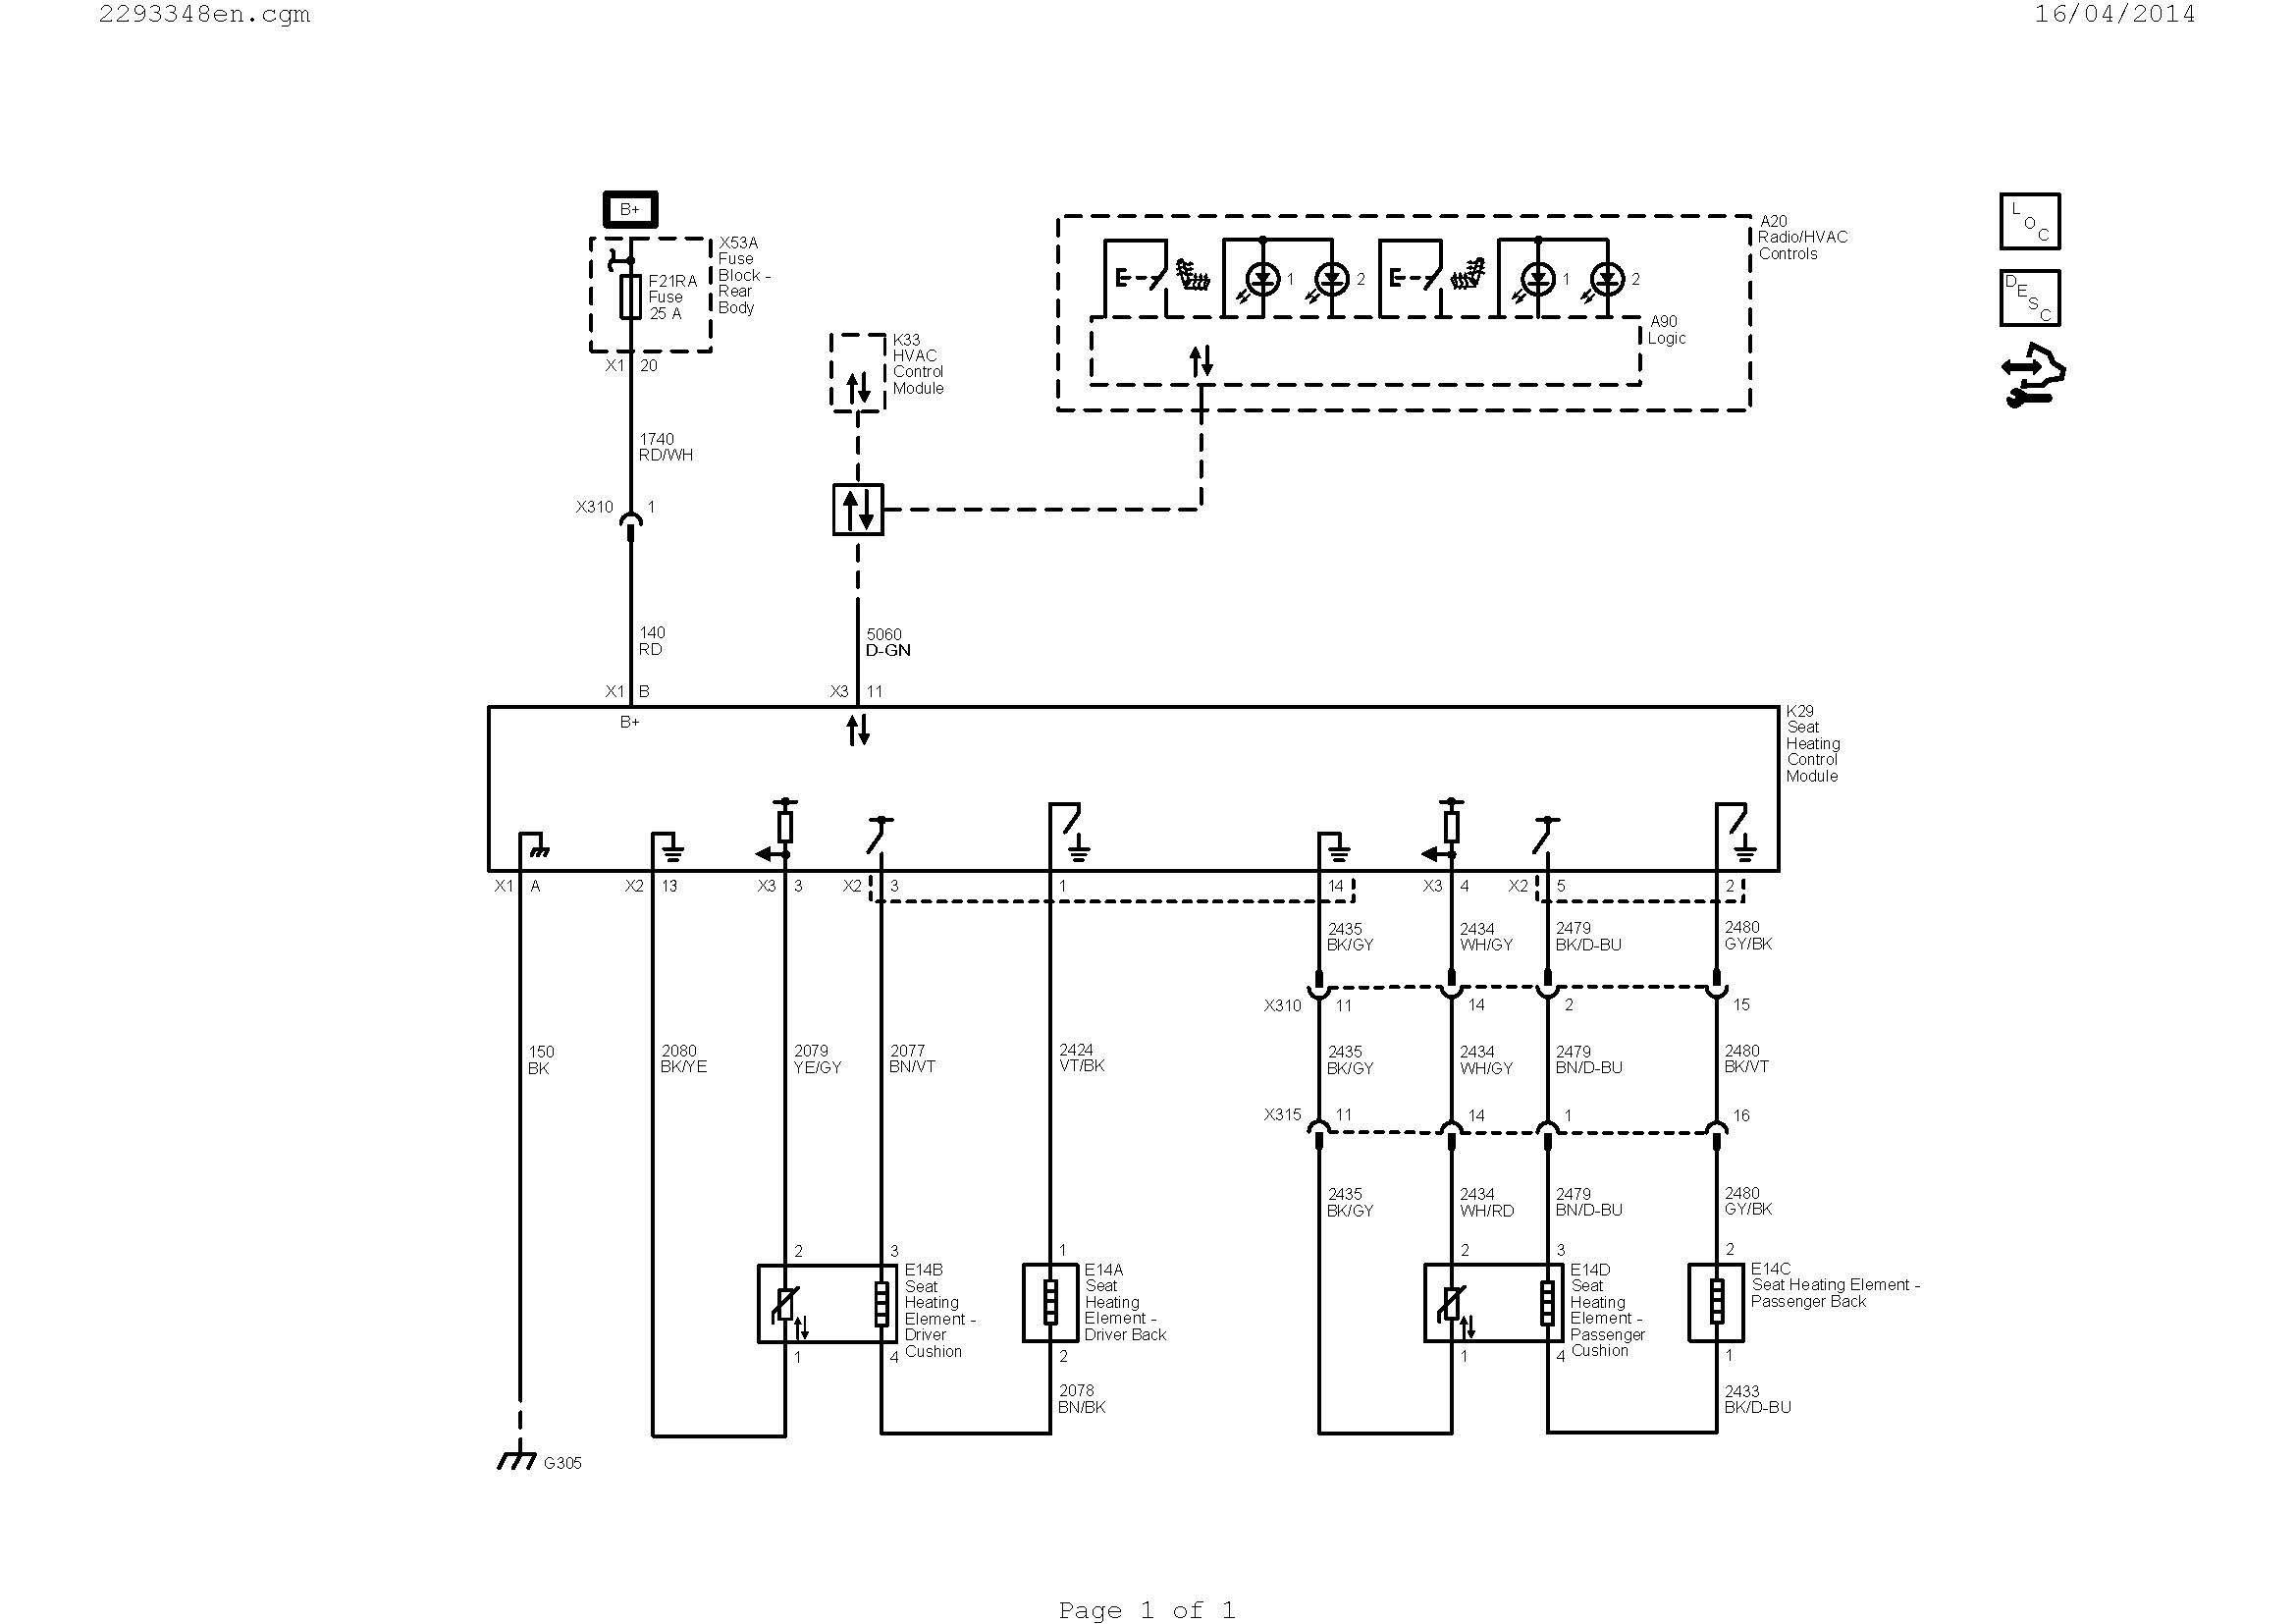 honda accord wiring diagram Collection-Honda Ac Wiring Diagram Fresh tower Ac Wiring Diagram New Hvac Diagram Best Hvac Diagram 0d 11-q